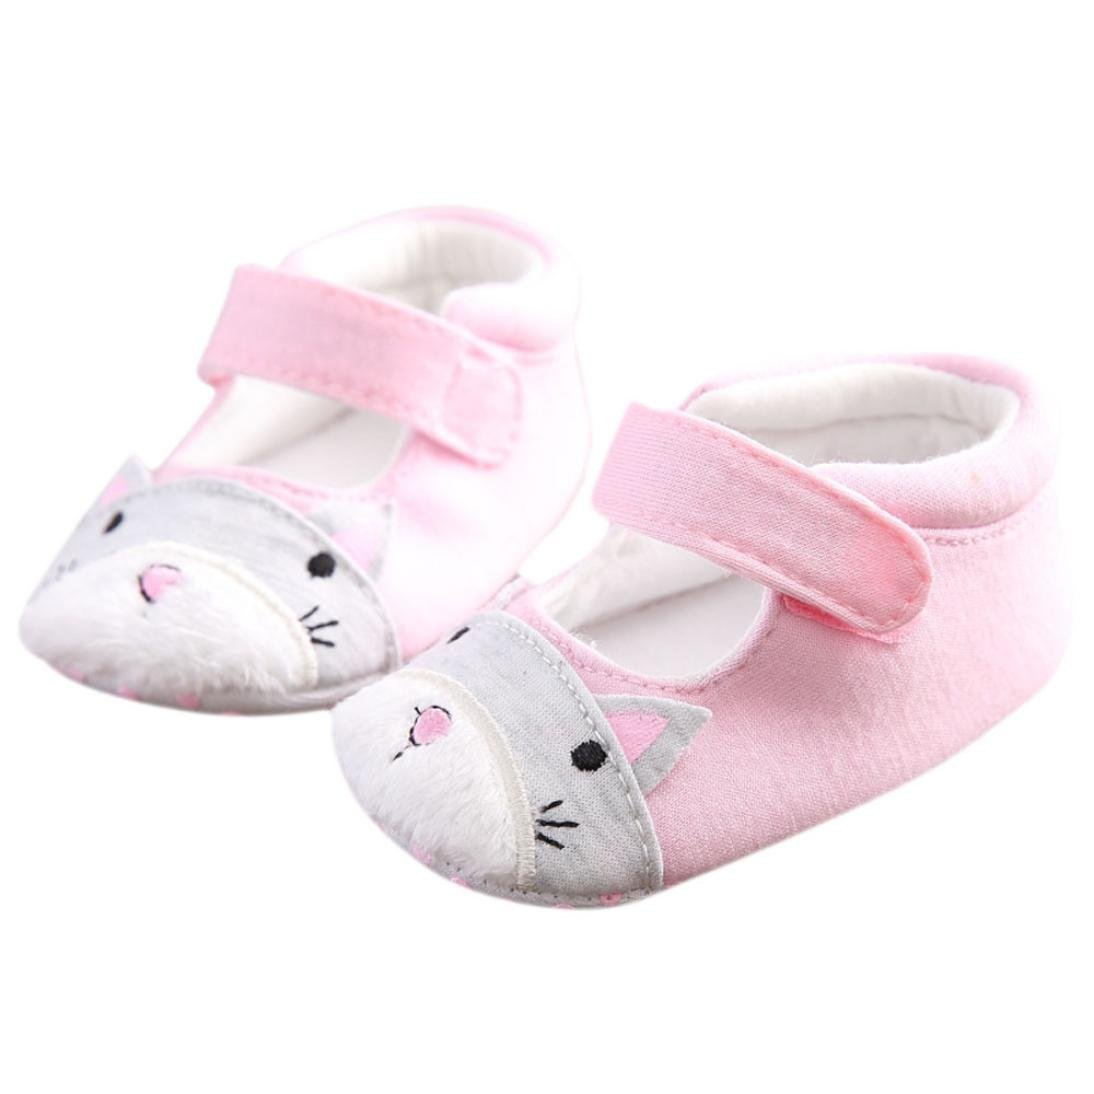 Vovotrade Recién Nacido Bebé Niña Ardilla Linda Diseño Zapatos Zapatilla Antideslizante Suela Blanda Toddler Primer Paso Zapatos Tela de algodón